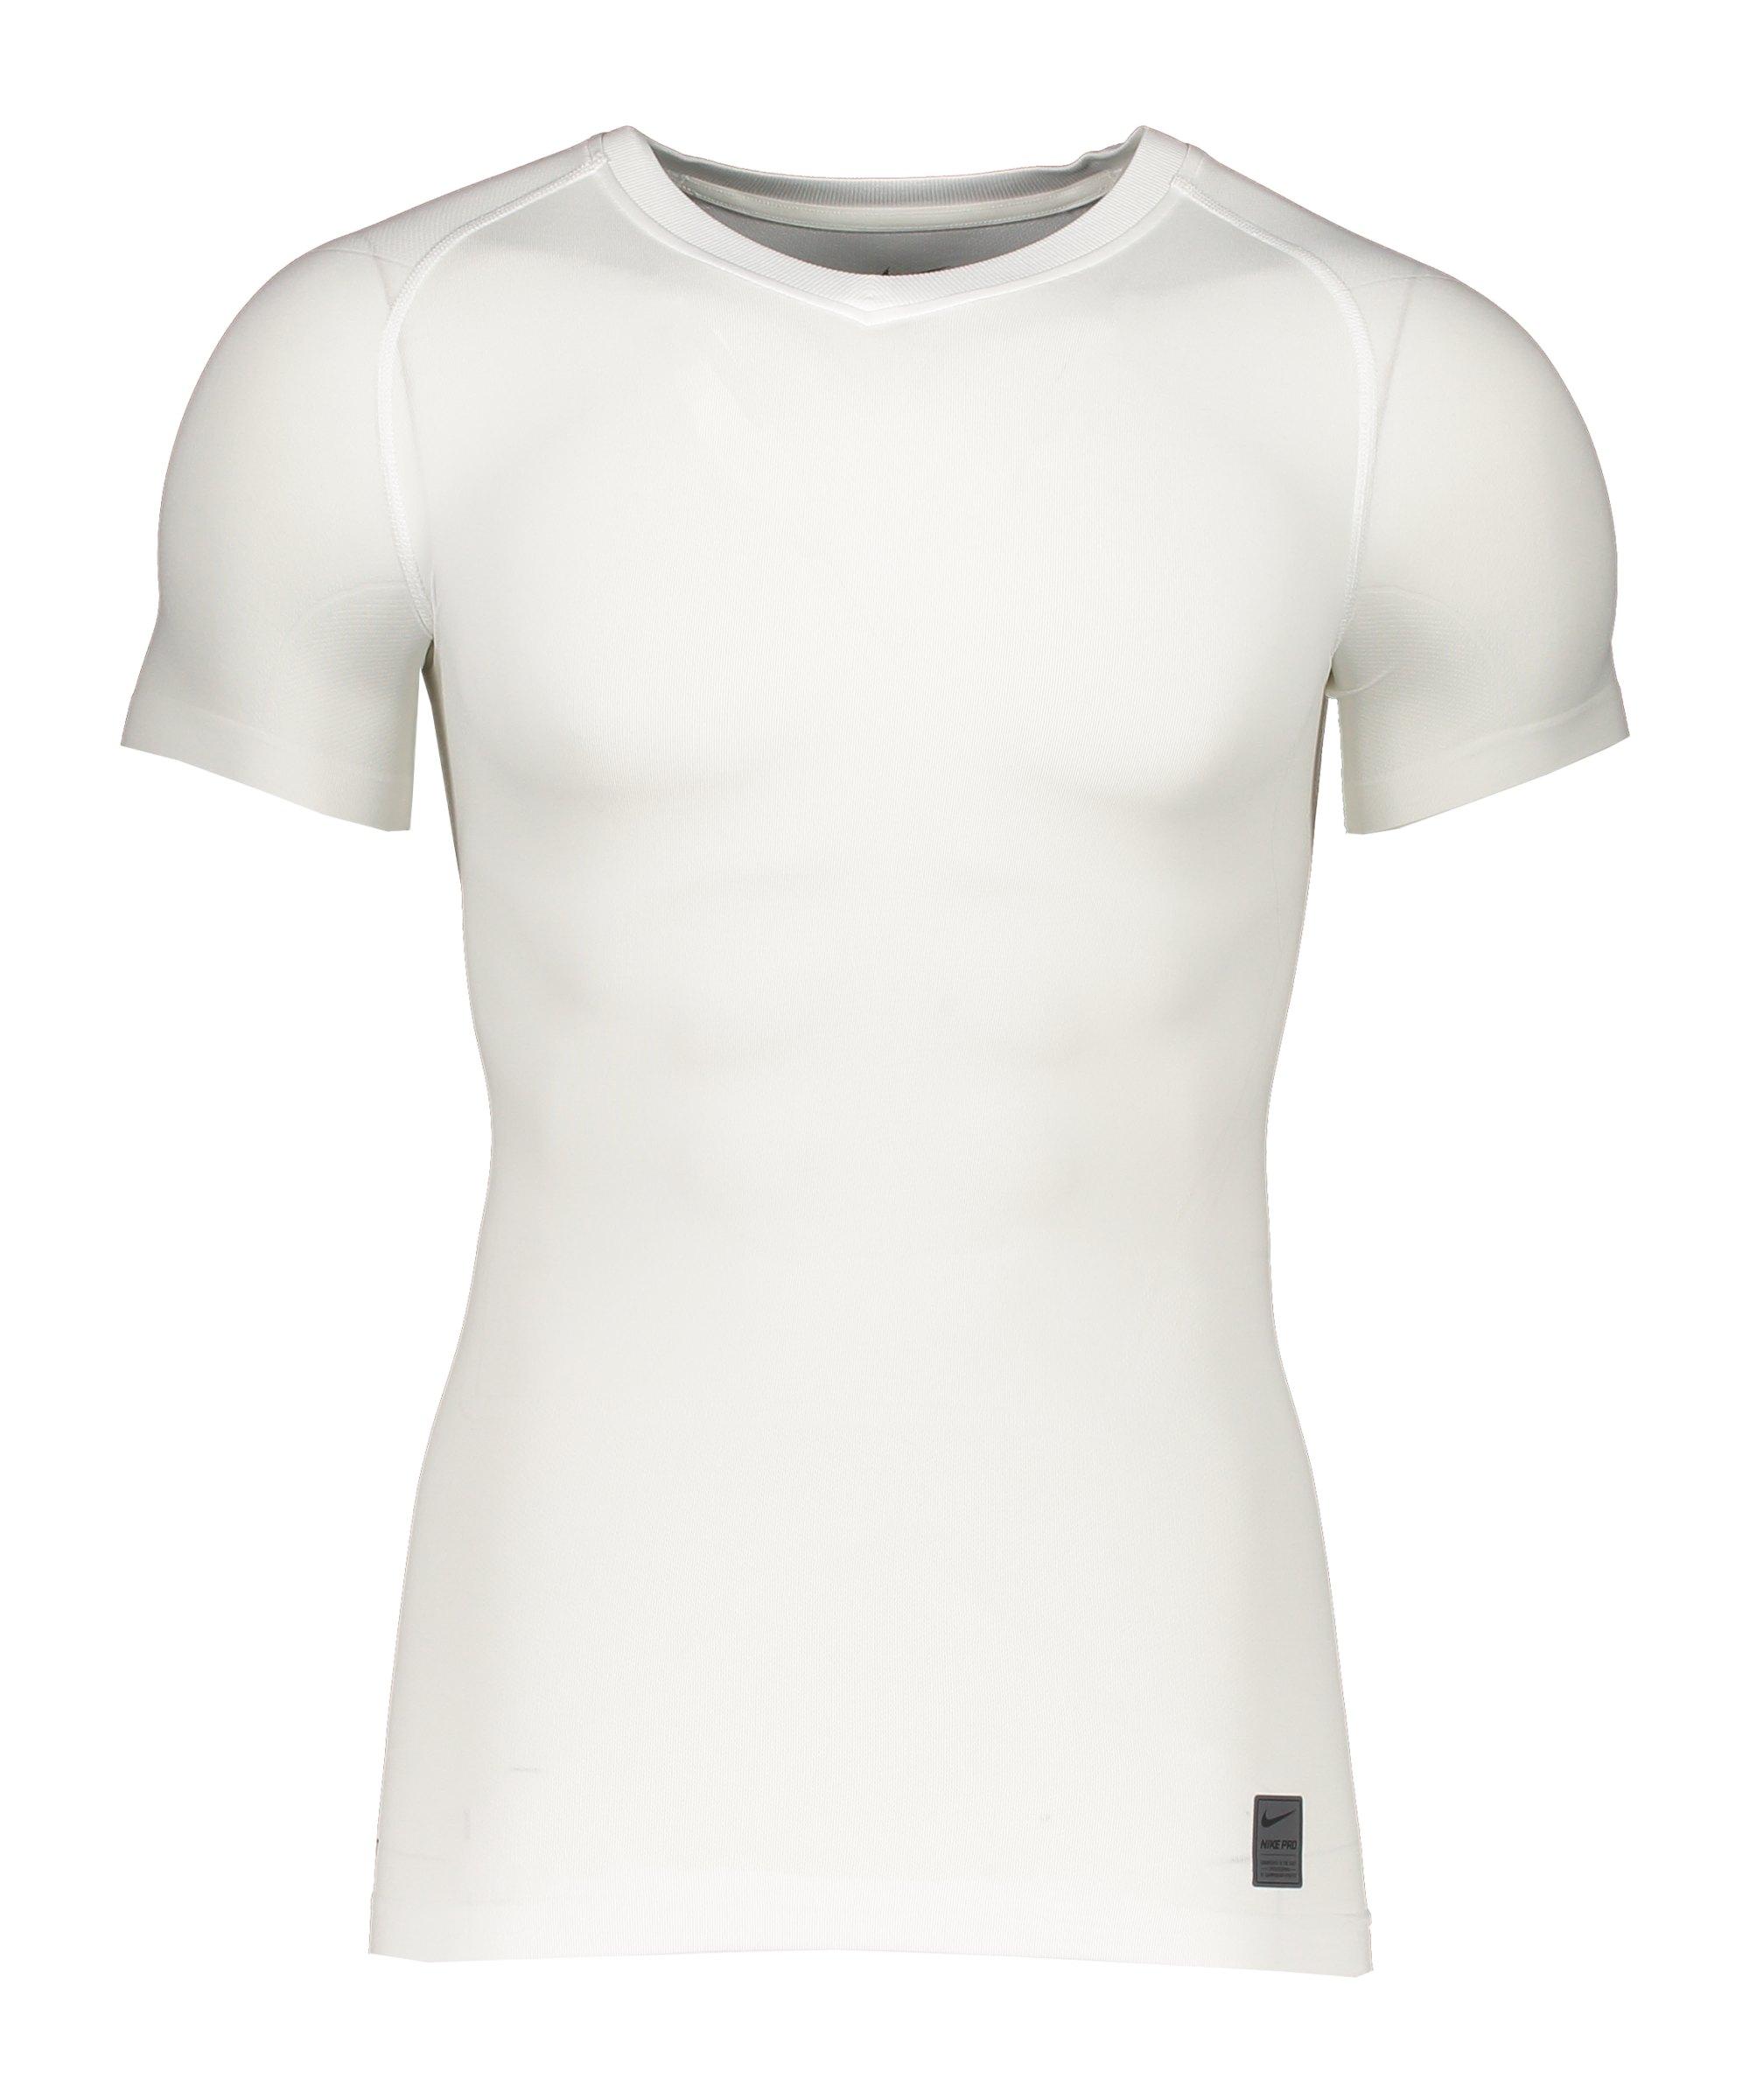 Nike NP Seamless Top Sweatshirt F100 - weiss